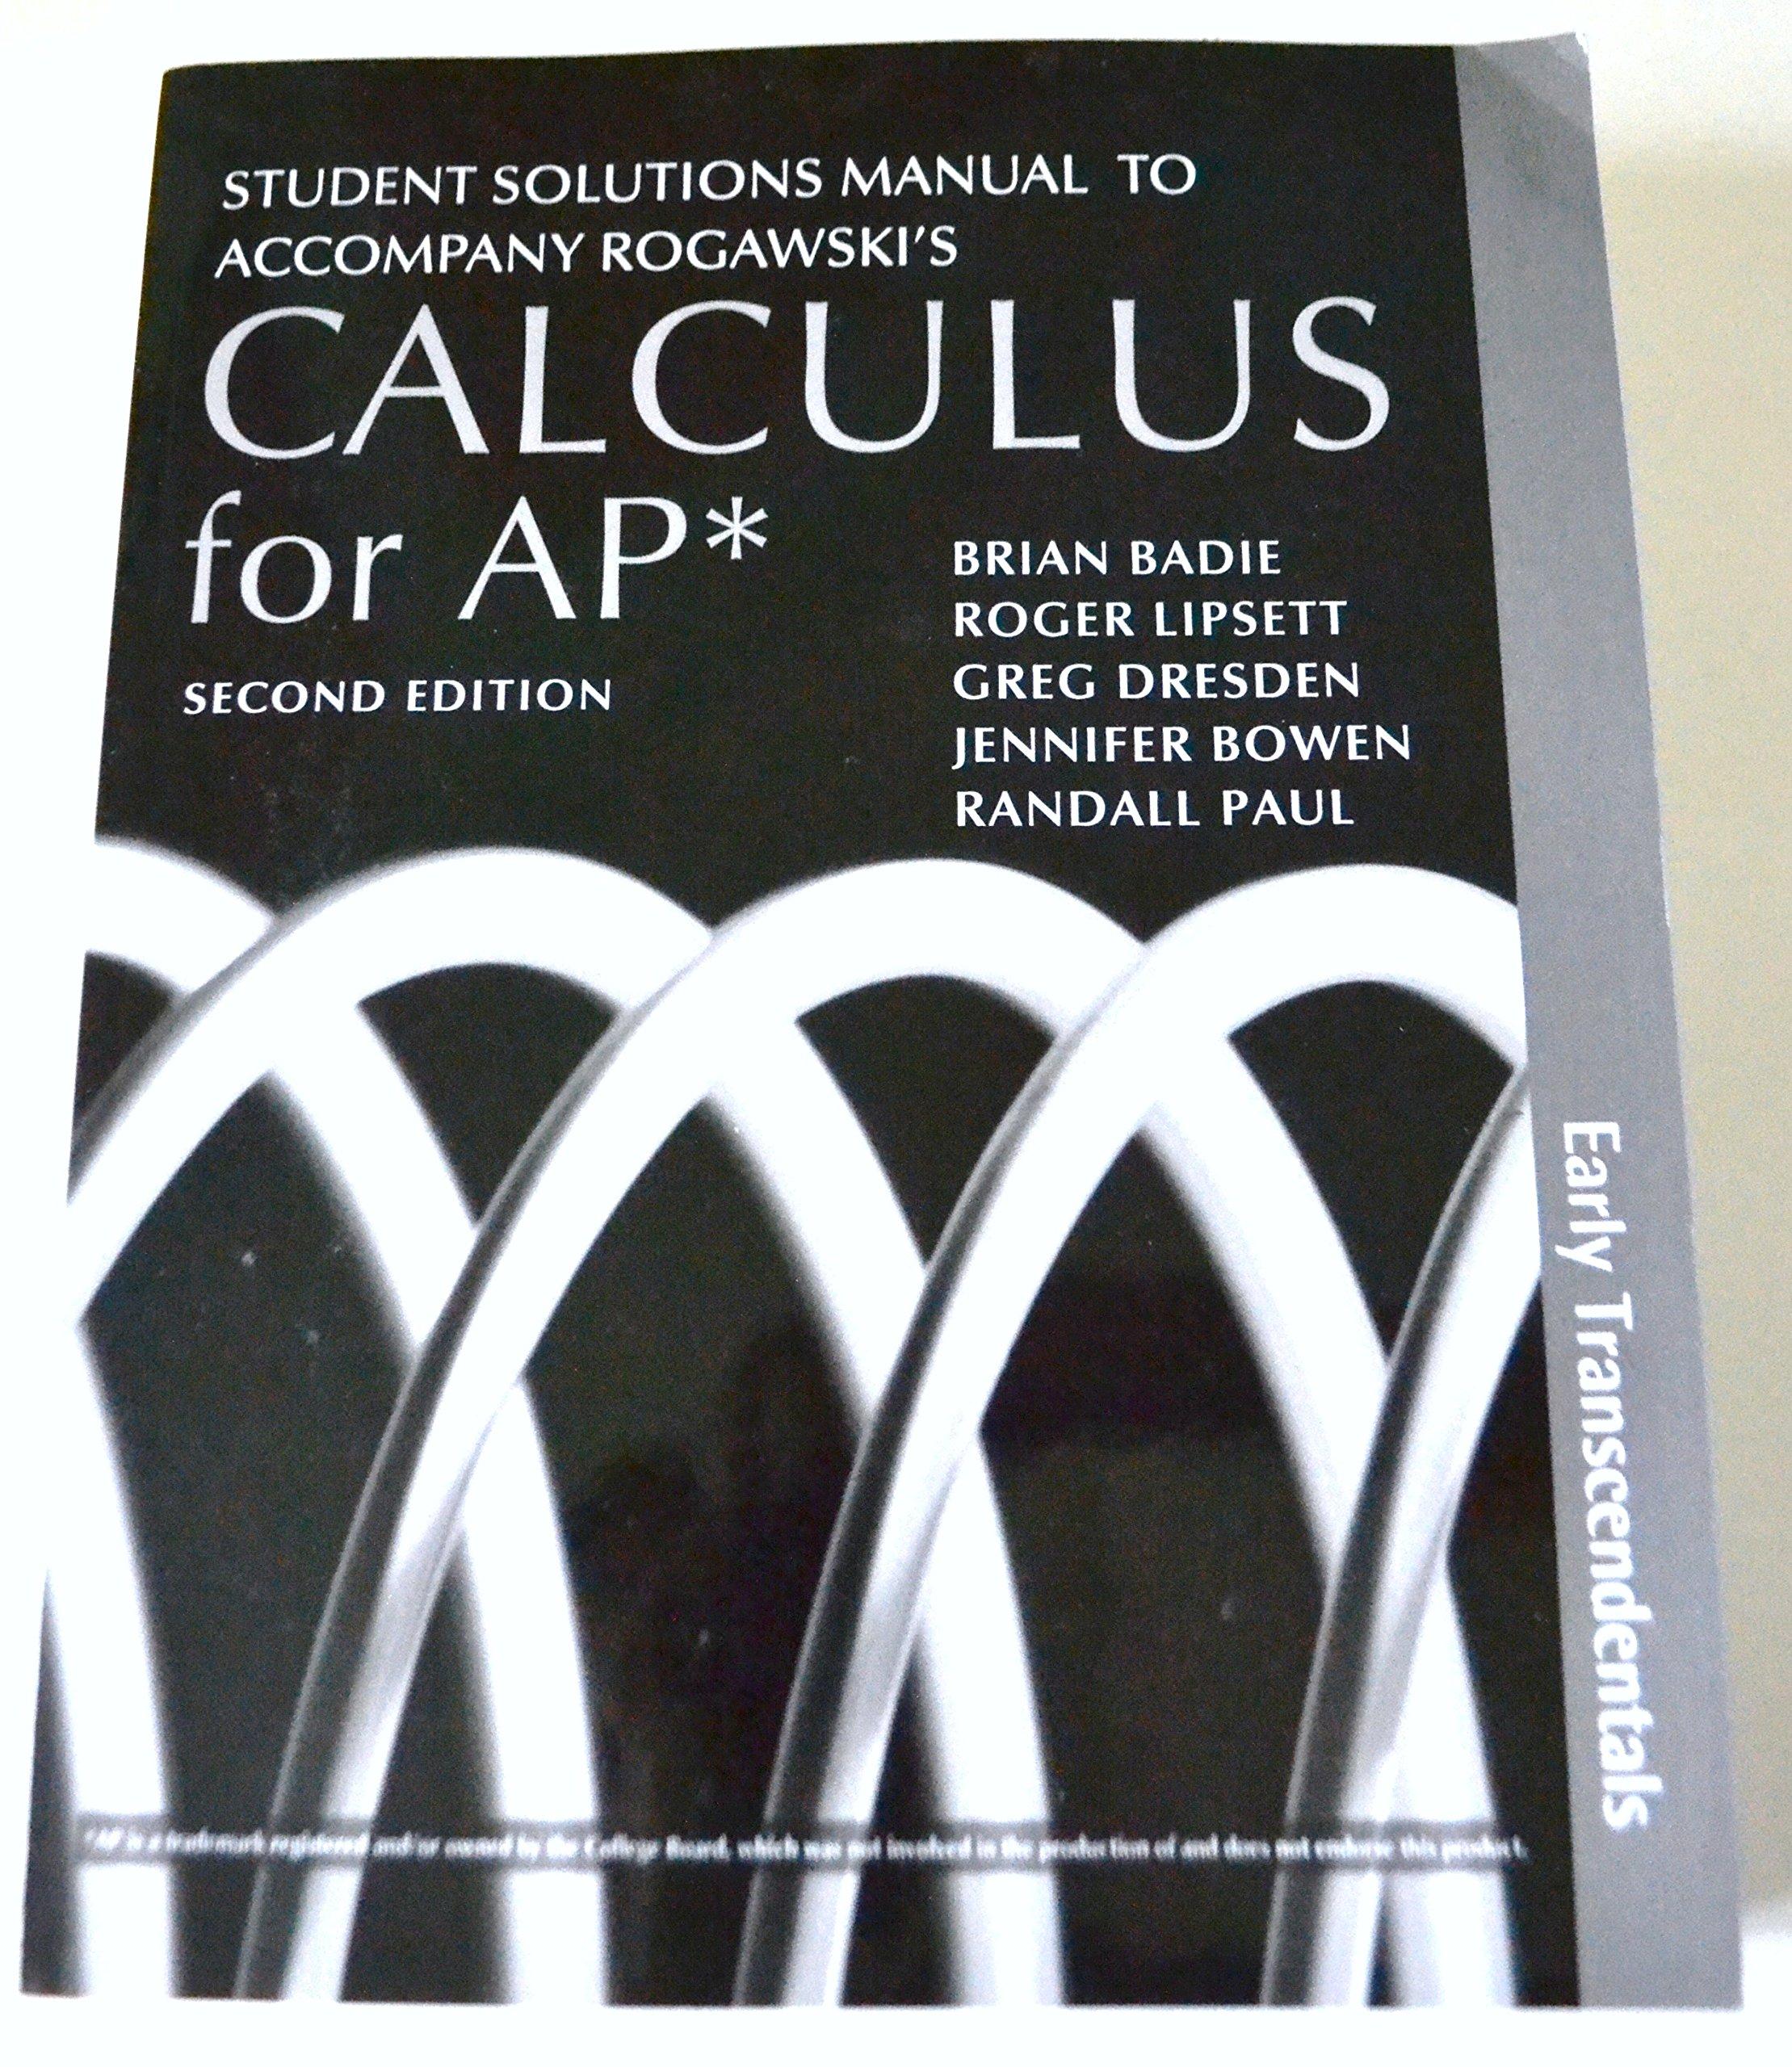 Student Solutions Manual to Accompany Rogawski's Calculus for AP - Early  Transcendentals: Brian Badie, Roger Lipsett, Greg Dresden, Jennifer Bowen,  ...